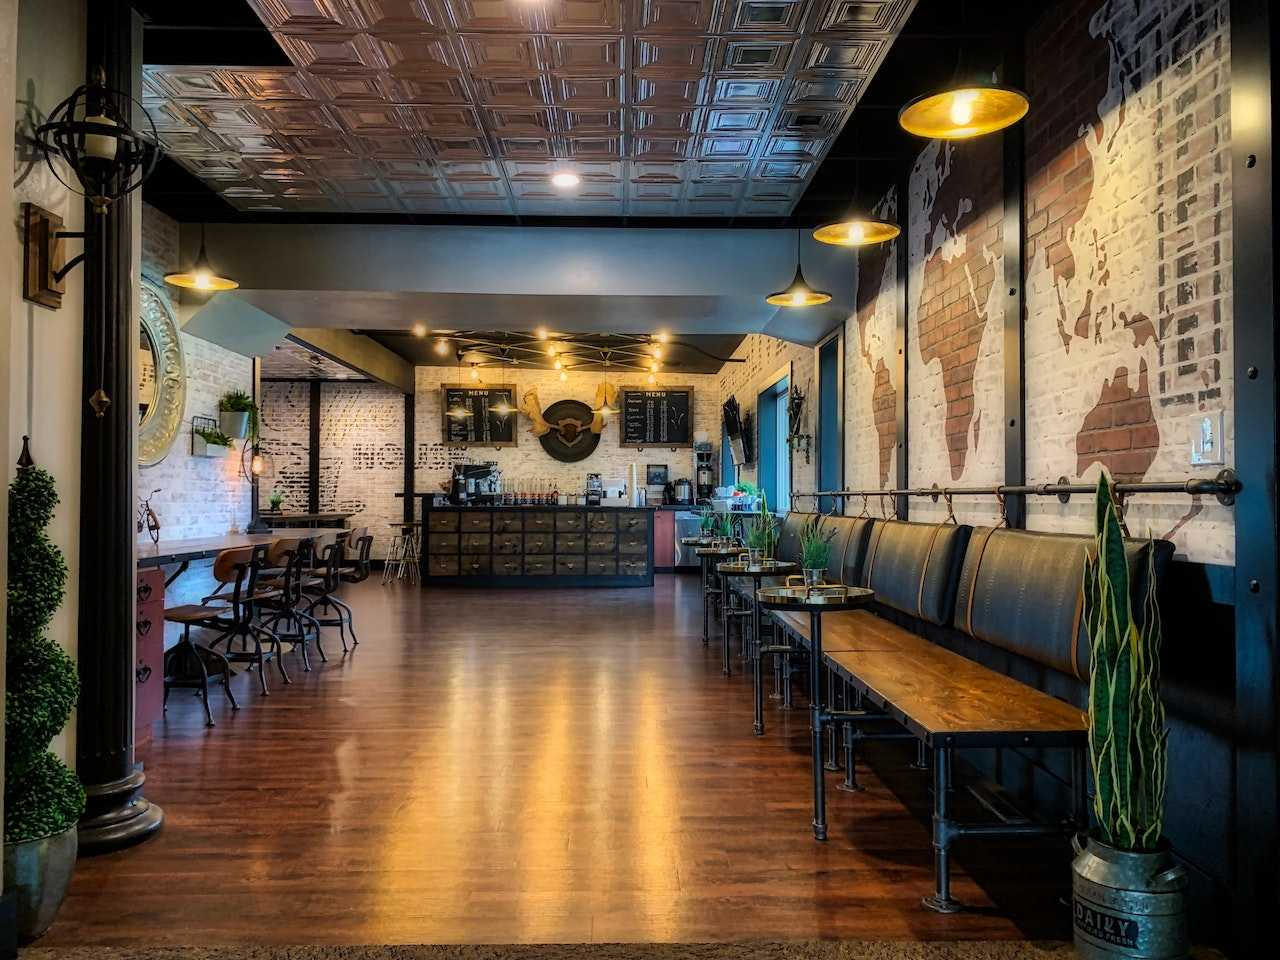 аренда ресторана в запорожье